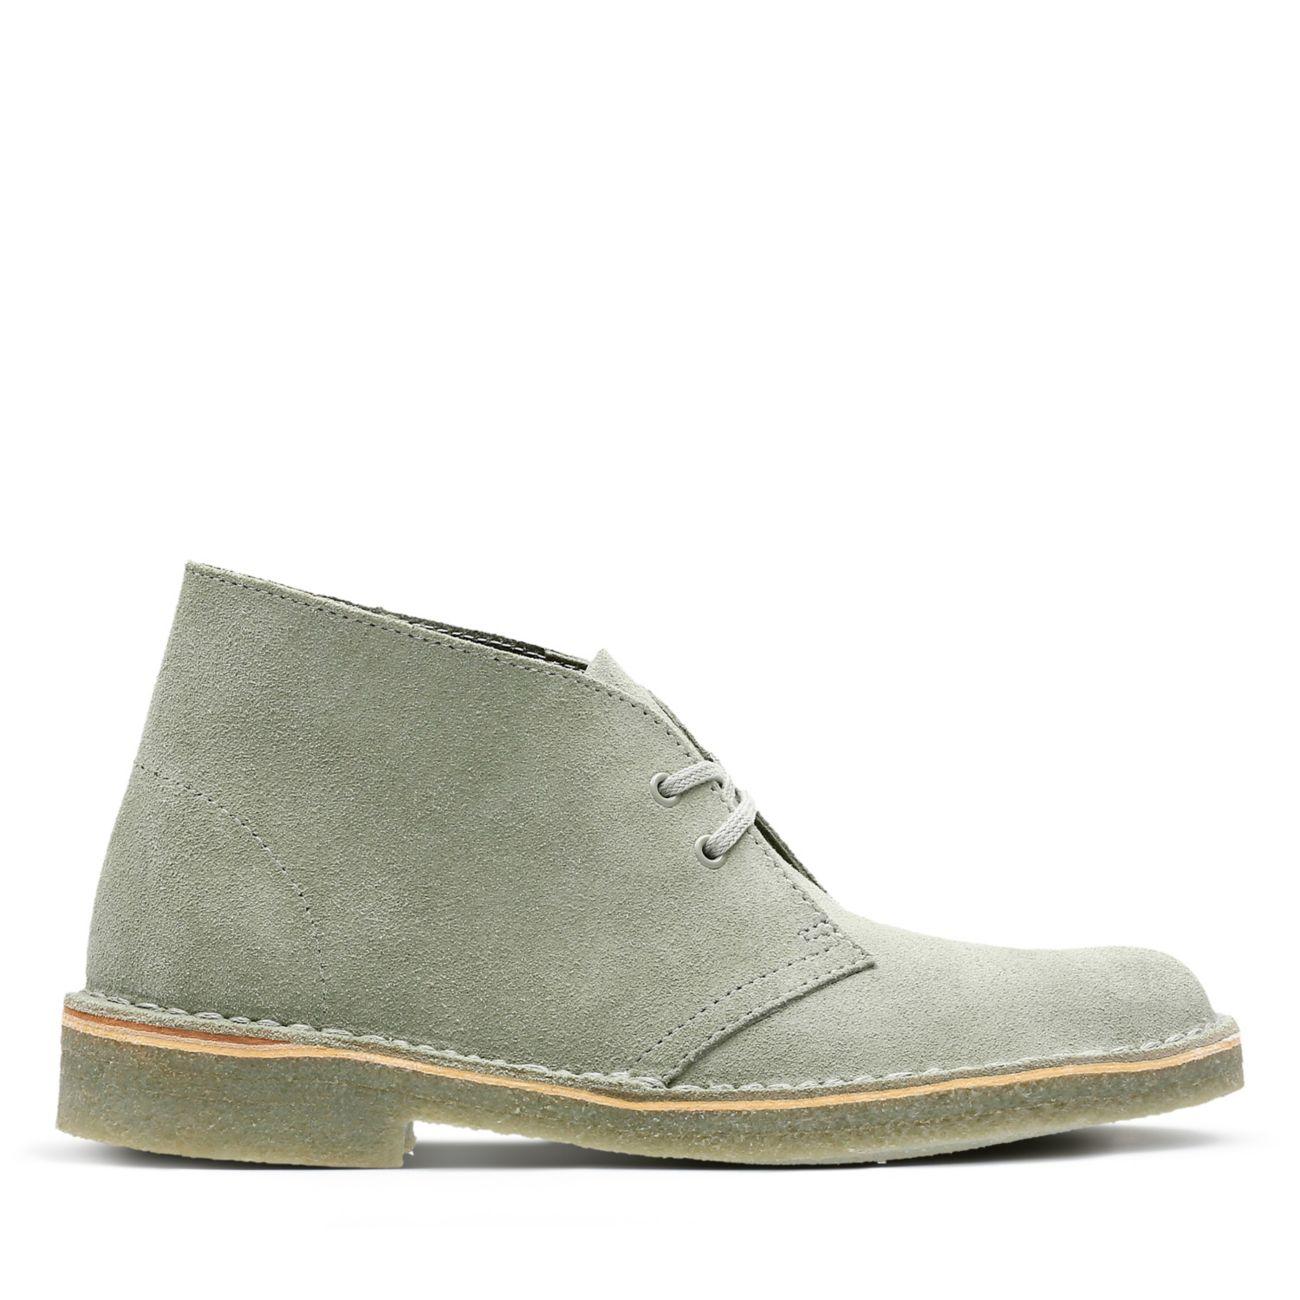 Herren Clarks Desert Boots ab 37 € Lyst